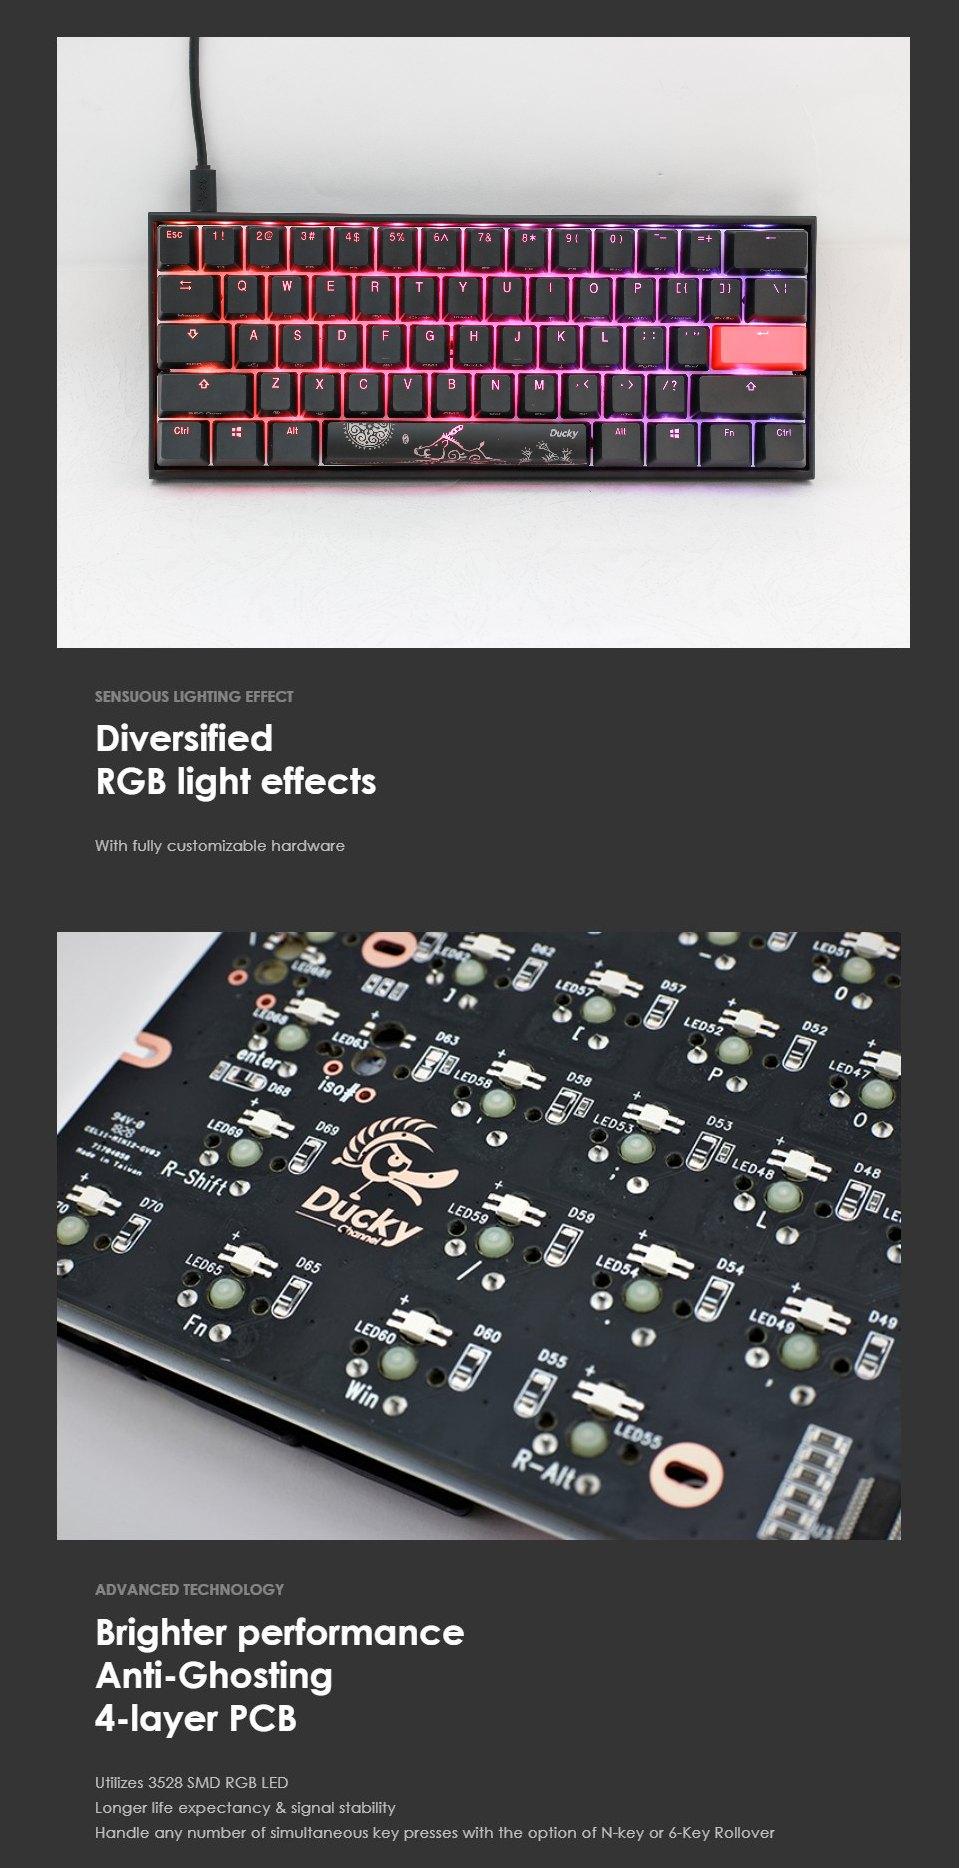 Ducky One 2 Mecha Mini RGB Mechanical Keyboard Silver features 3